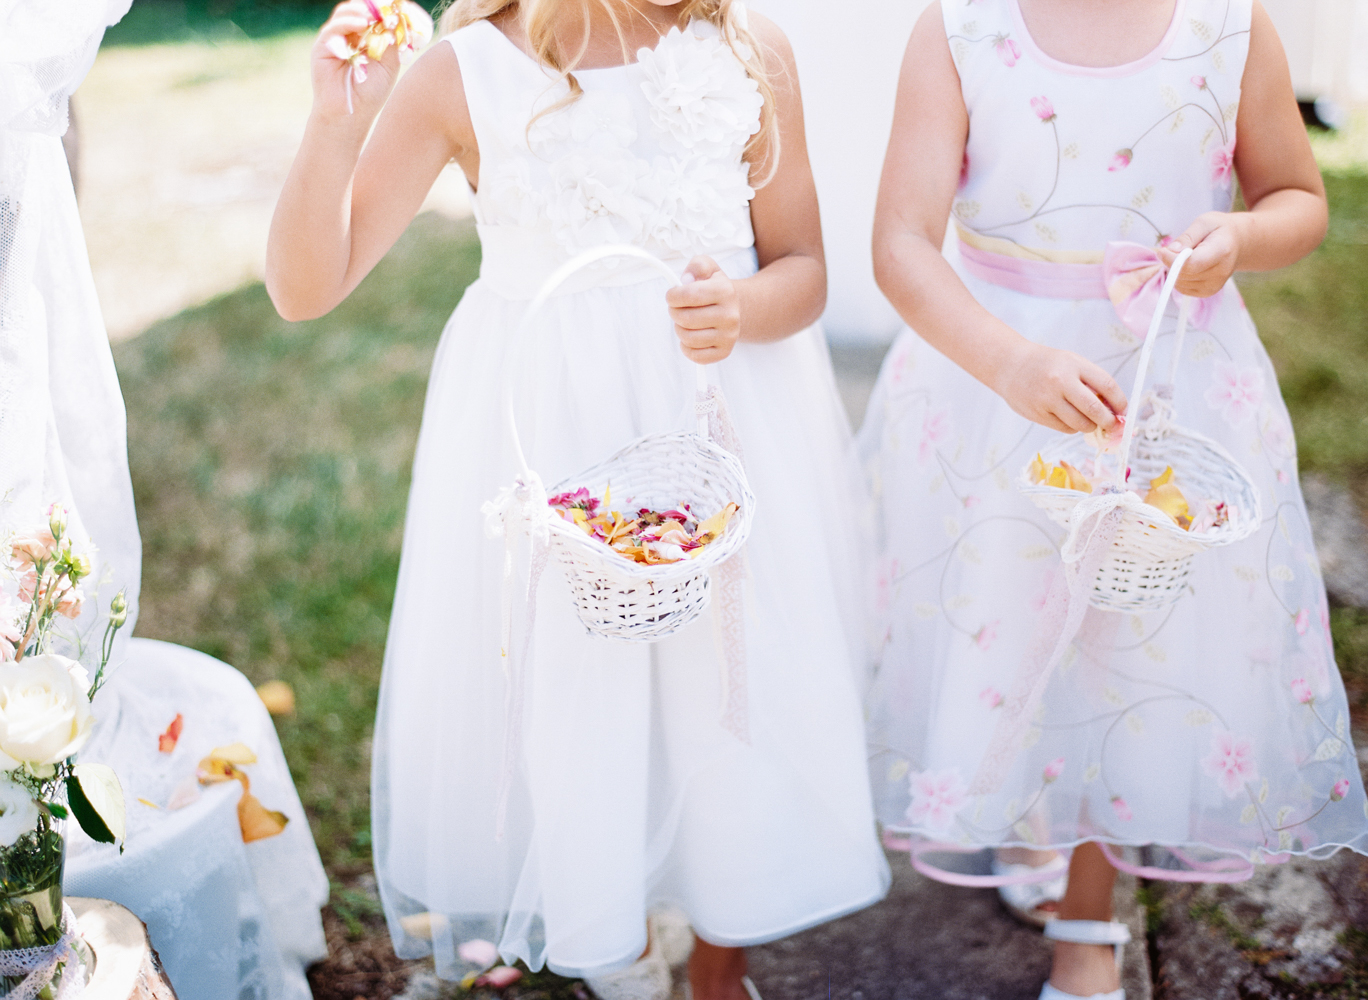 Hochzeitsfotograf_Stuttgart_Karoline_Kirchhof (3).jpg